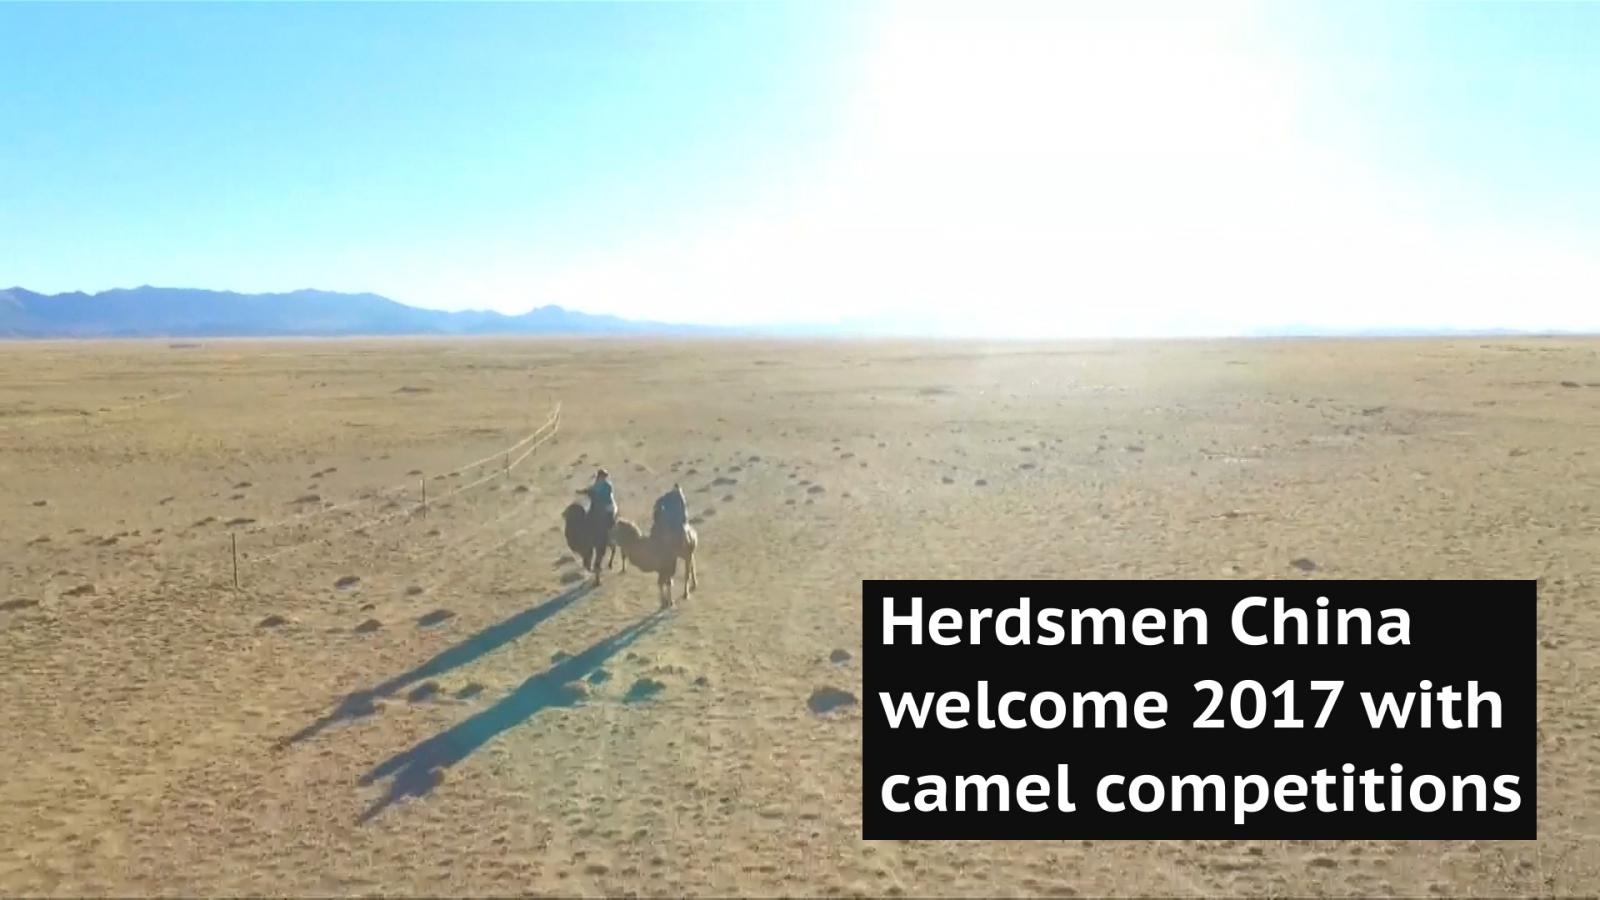 Herdsmen in north China